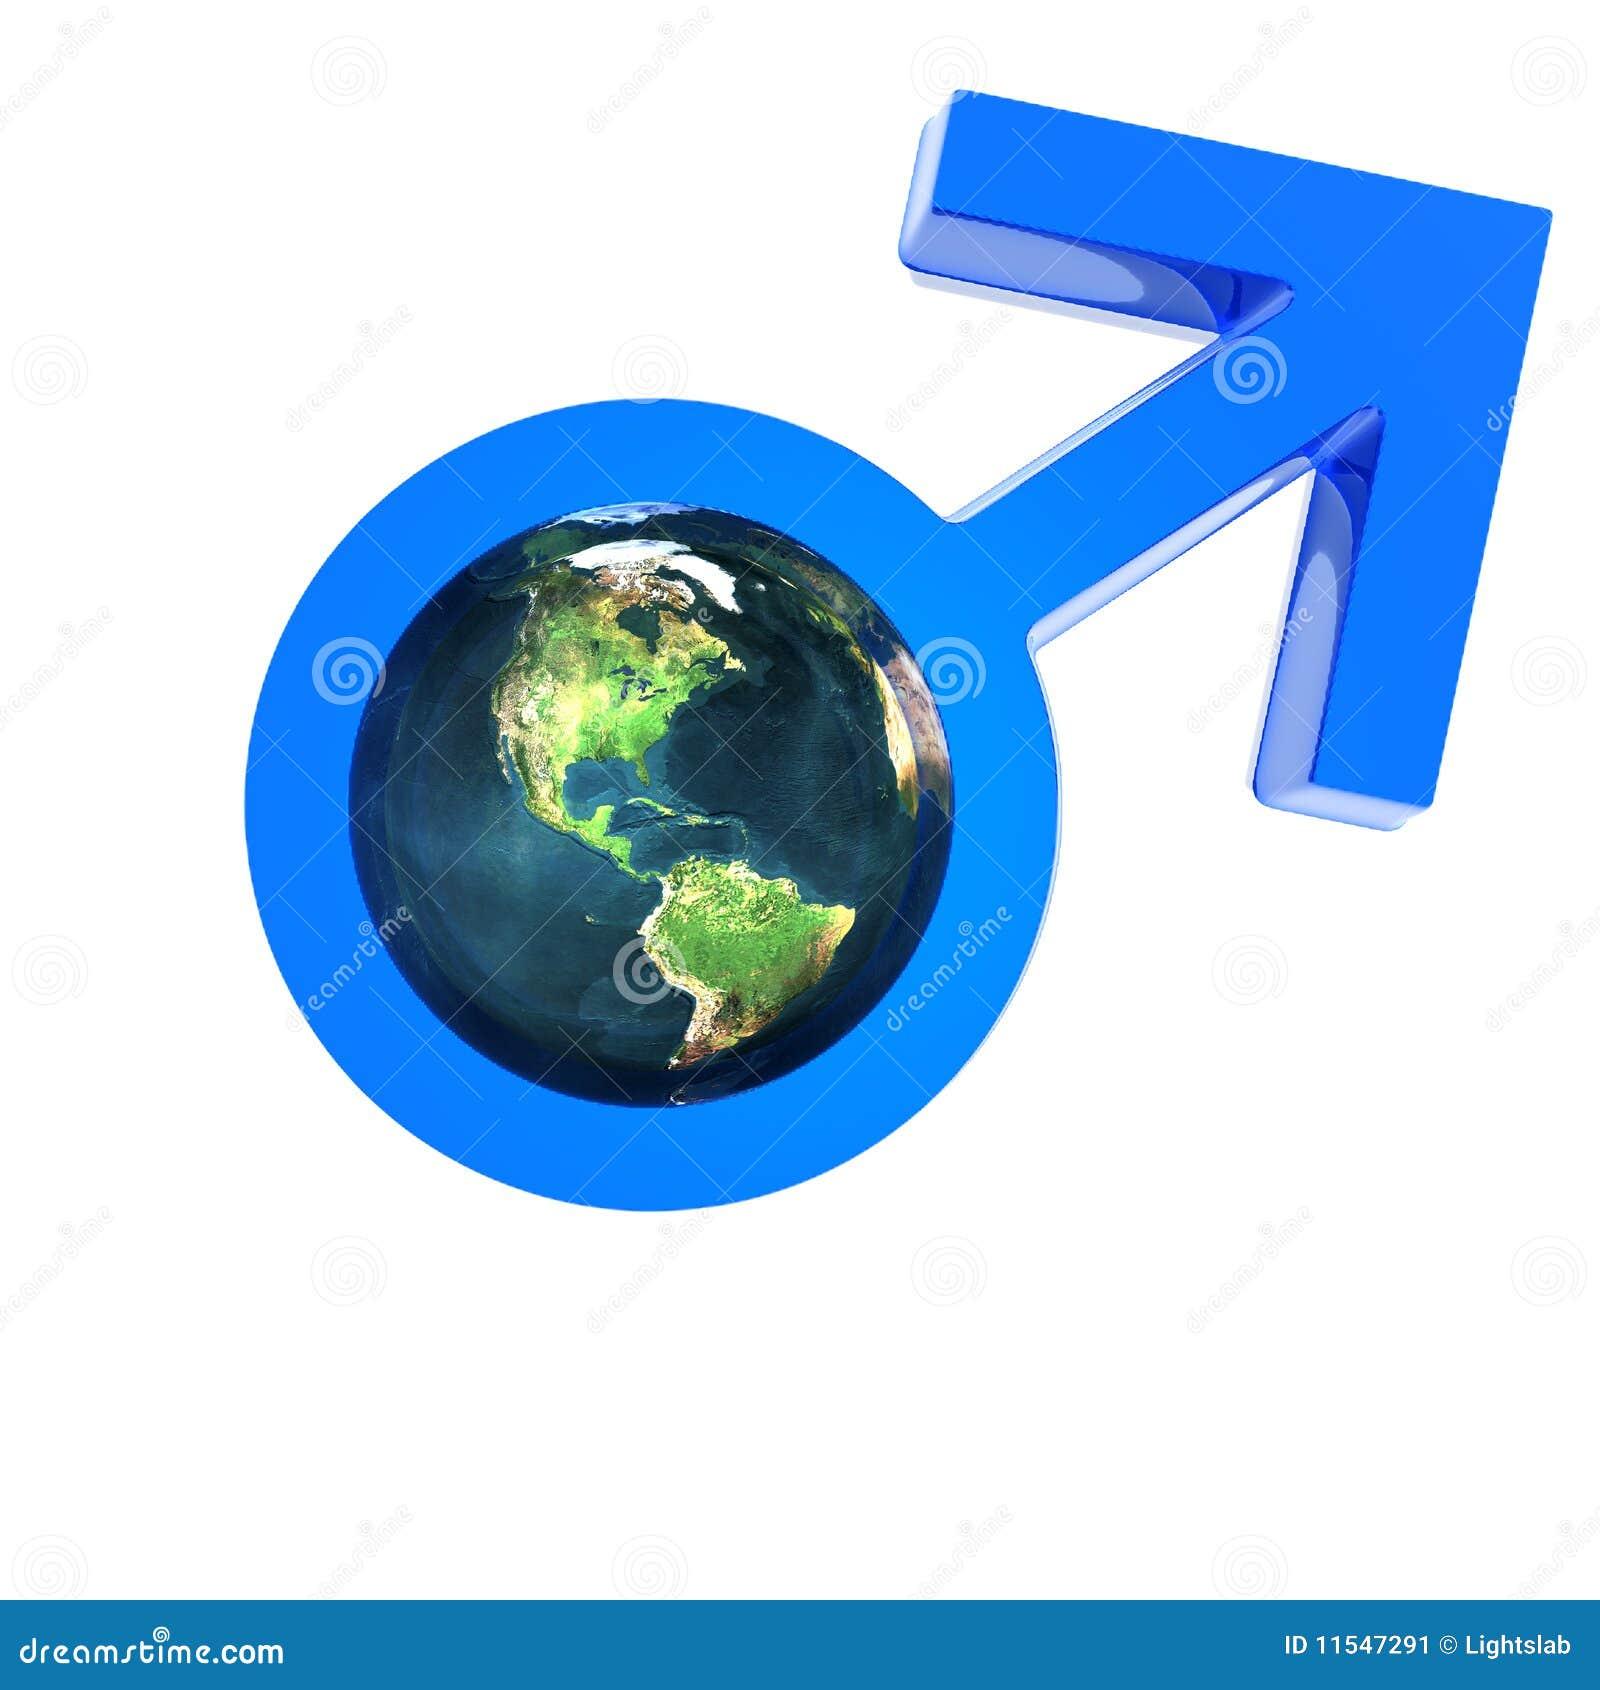 Mars symbol isolated on a white background stock illustration royalty free stock photo biocorpaavc Choice Image